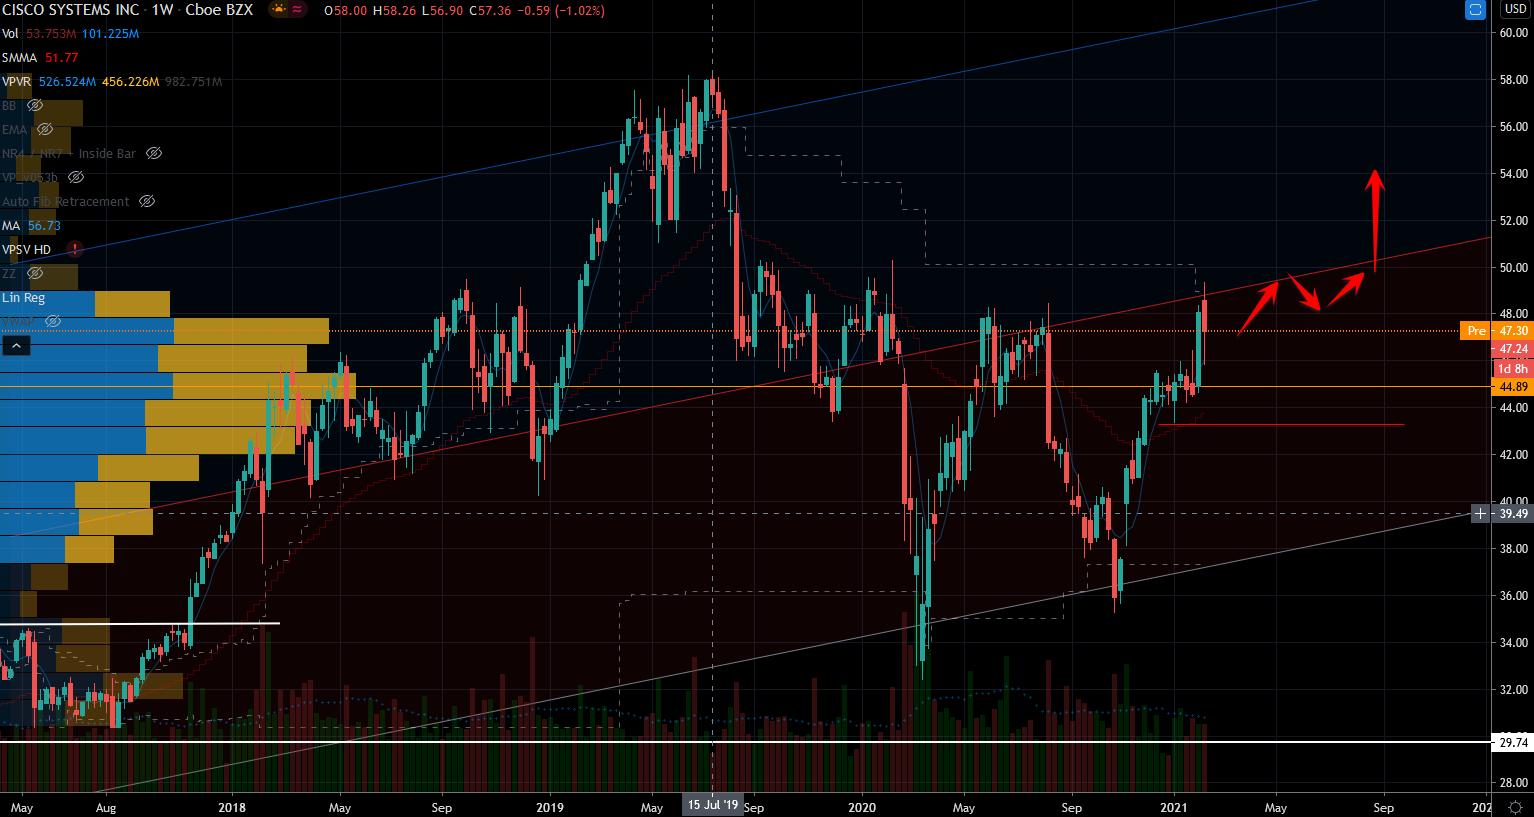 Mega-cap stocks: Cisco (CSCO) Stock Chart Showing Potential Bounce